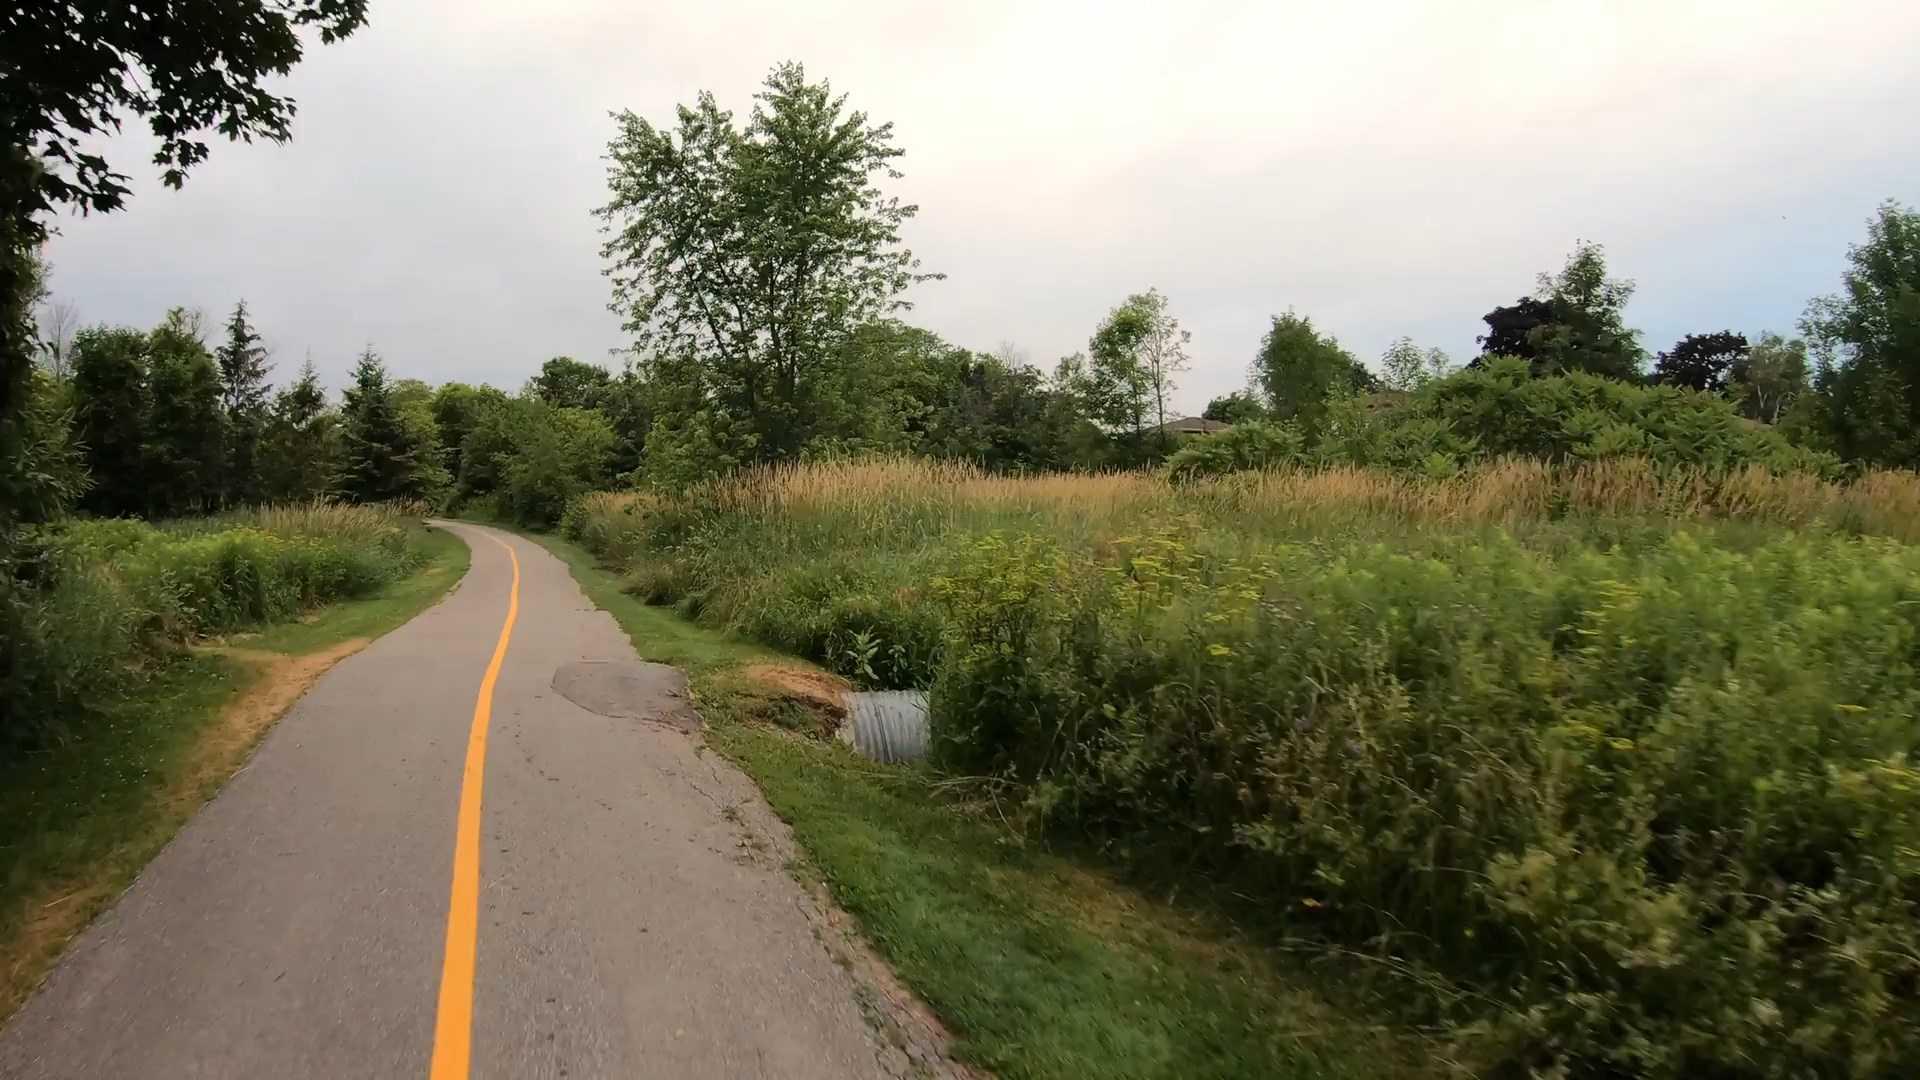 Ontario Waterfront Trail